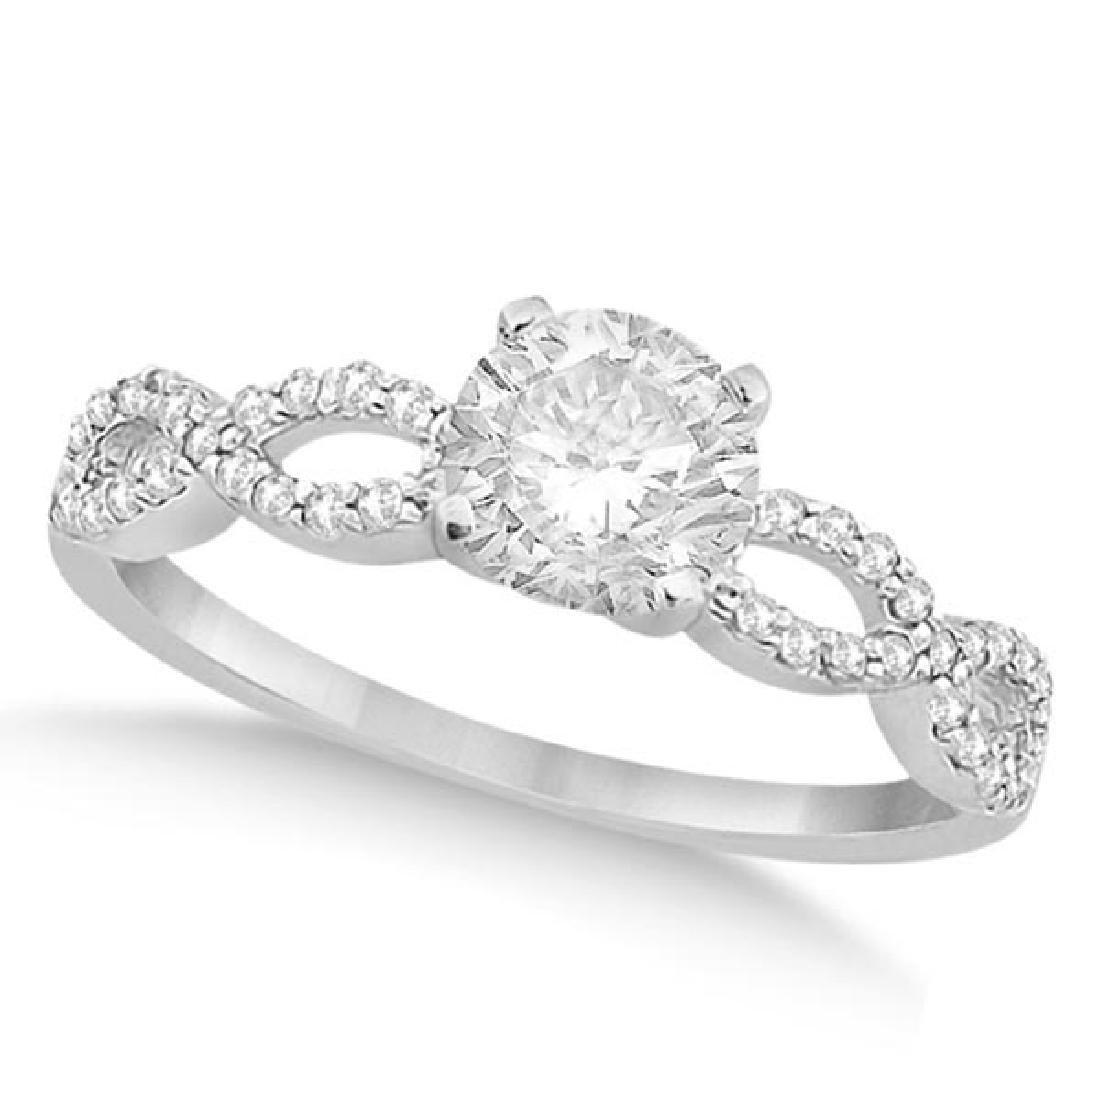 Twisted Infinity Round Diamond Engagement Ring 14k Whit